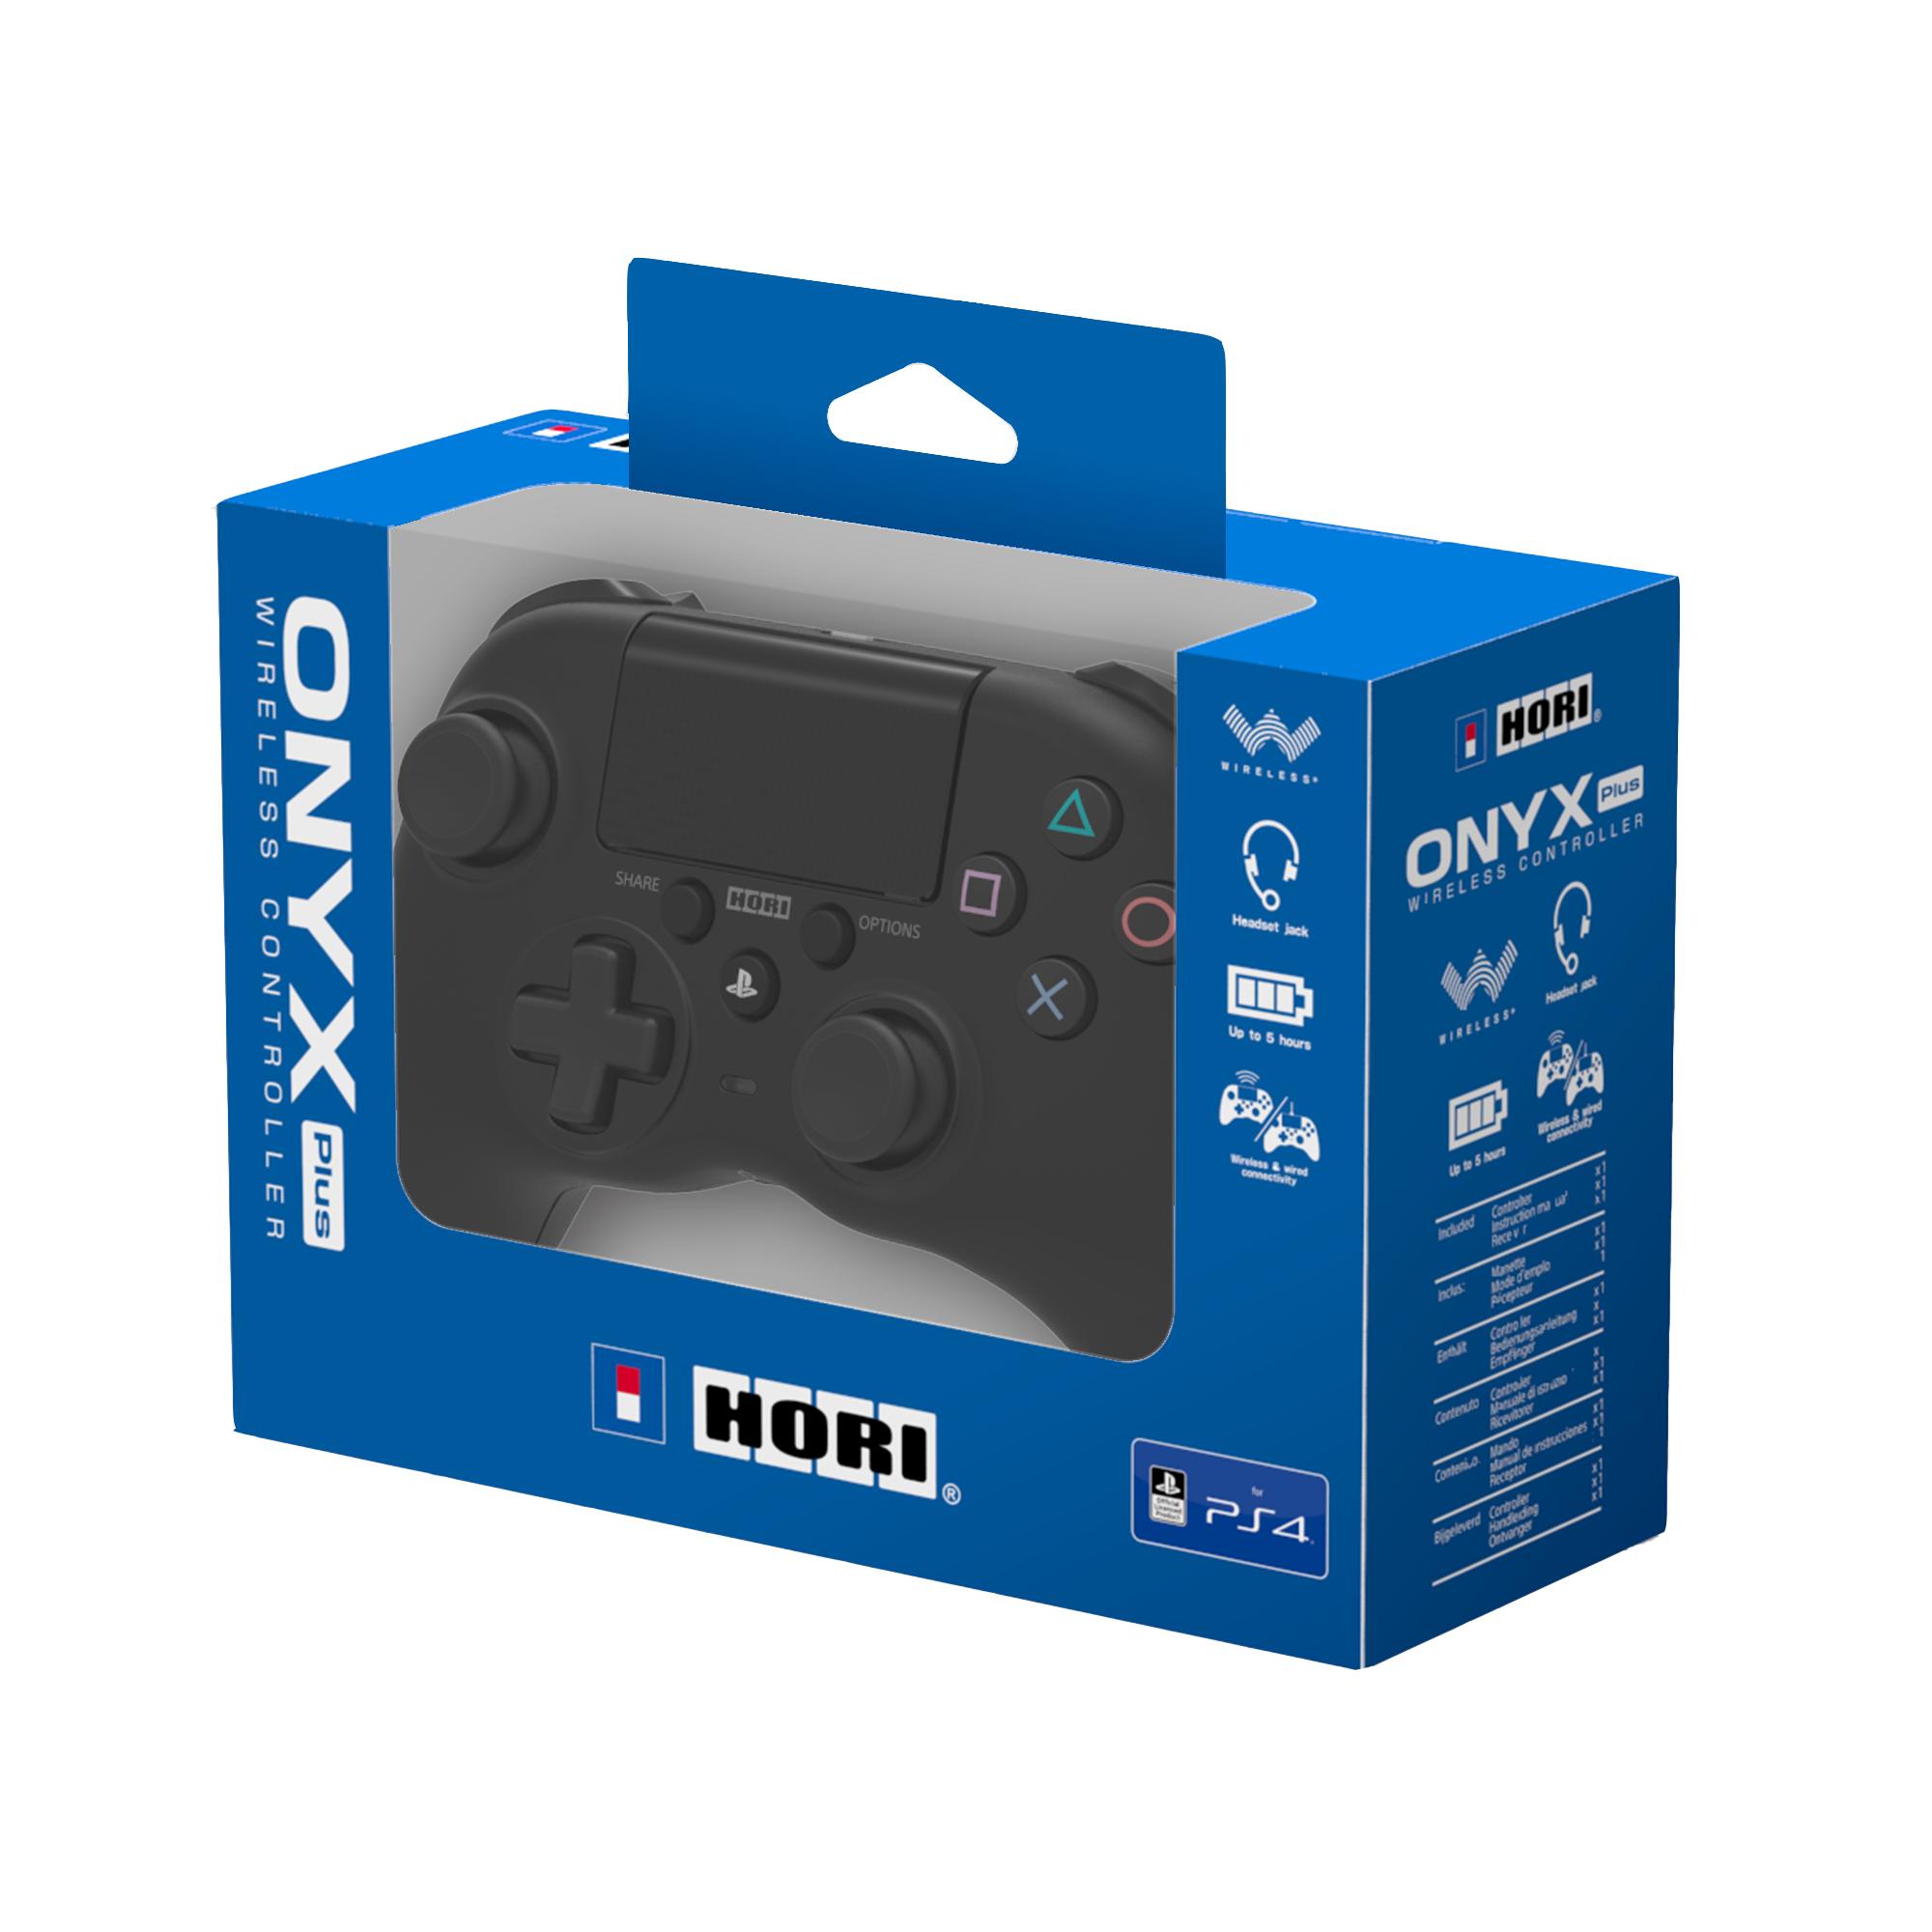 Hori New Playstation Onyx Wireless Controller